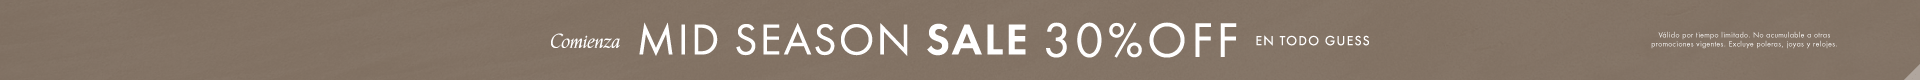 Mid Season Sale | Guess Chile